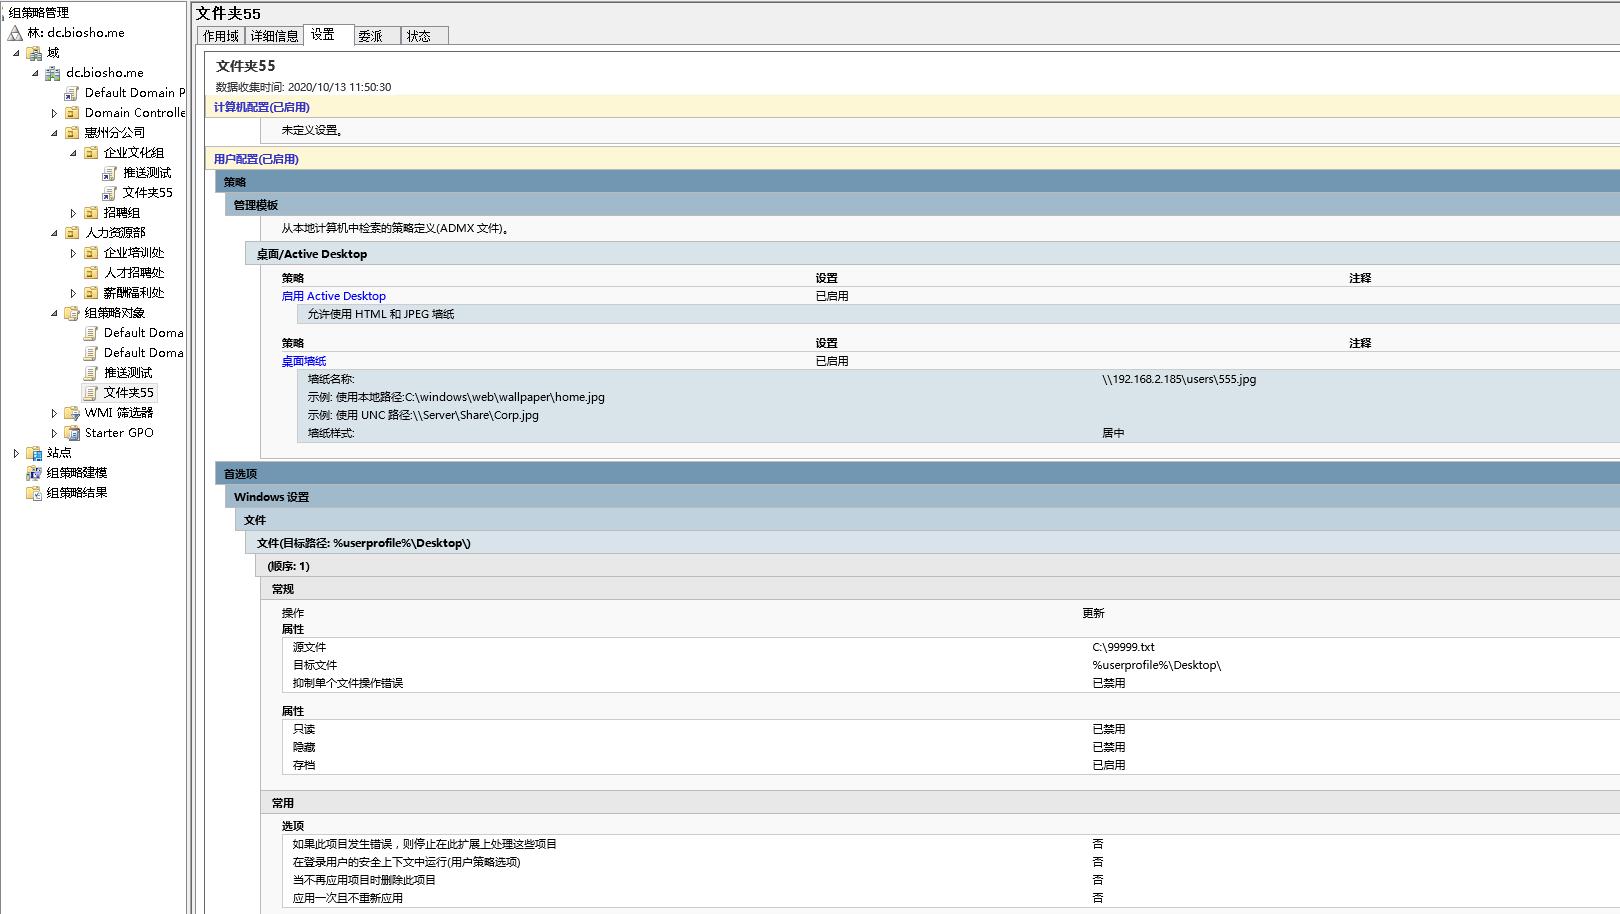 《windows server2012推送壁纸及创建文件夹、文件至域用户客户端》